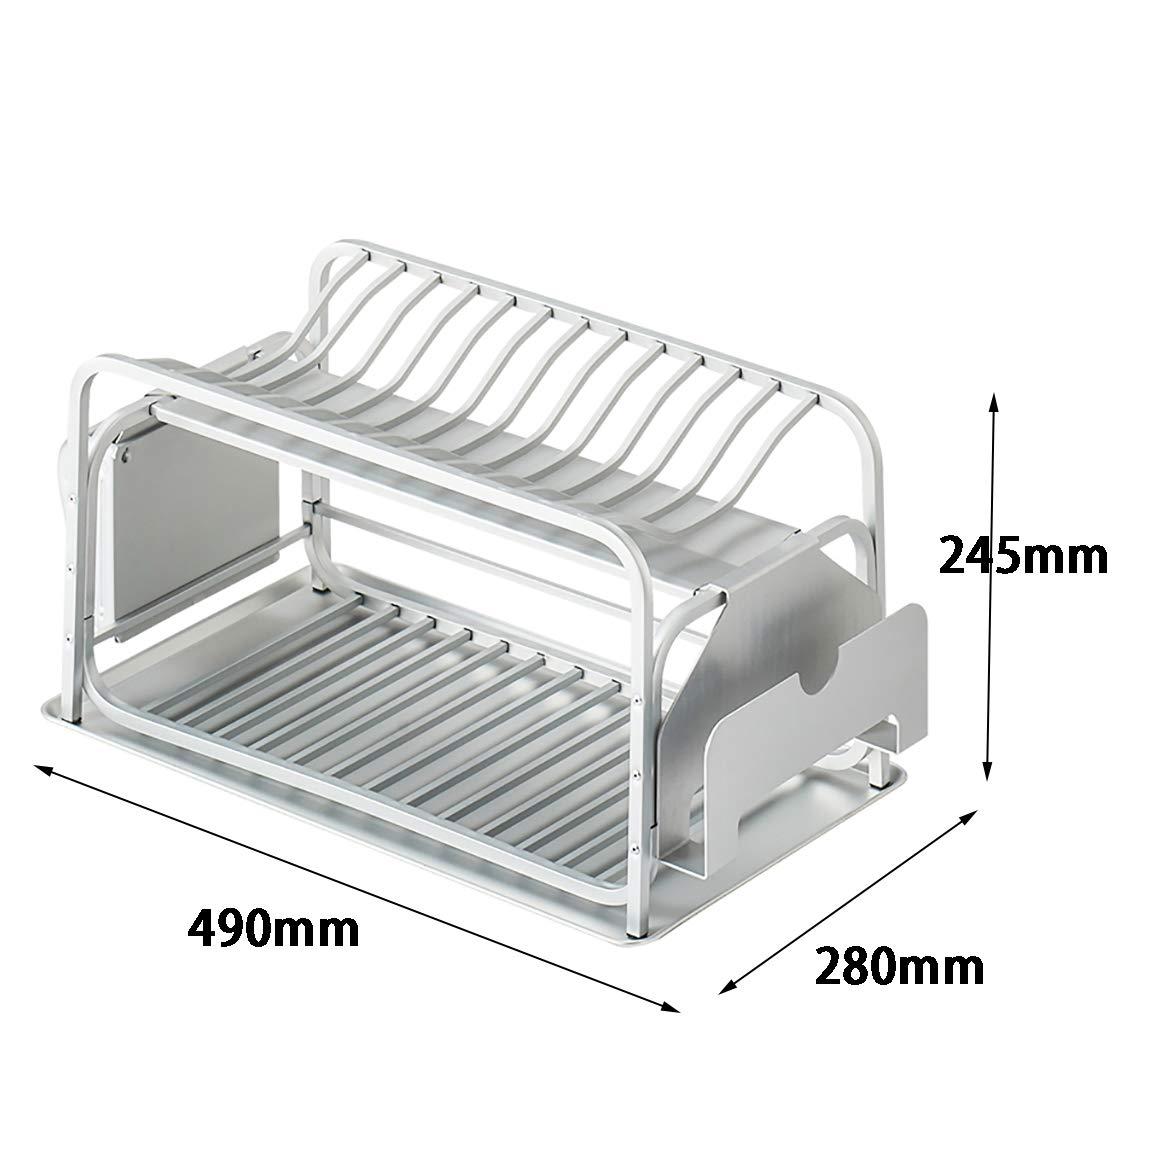 Rack de cocina de 2 niveles, rejilla de drenaje, caja de ...